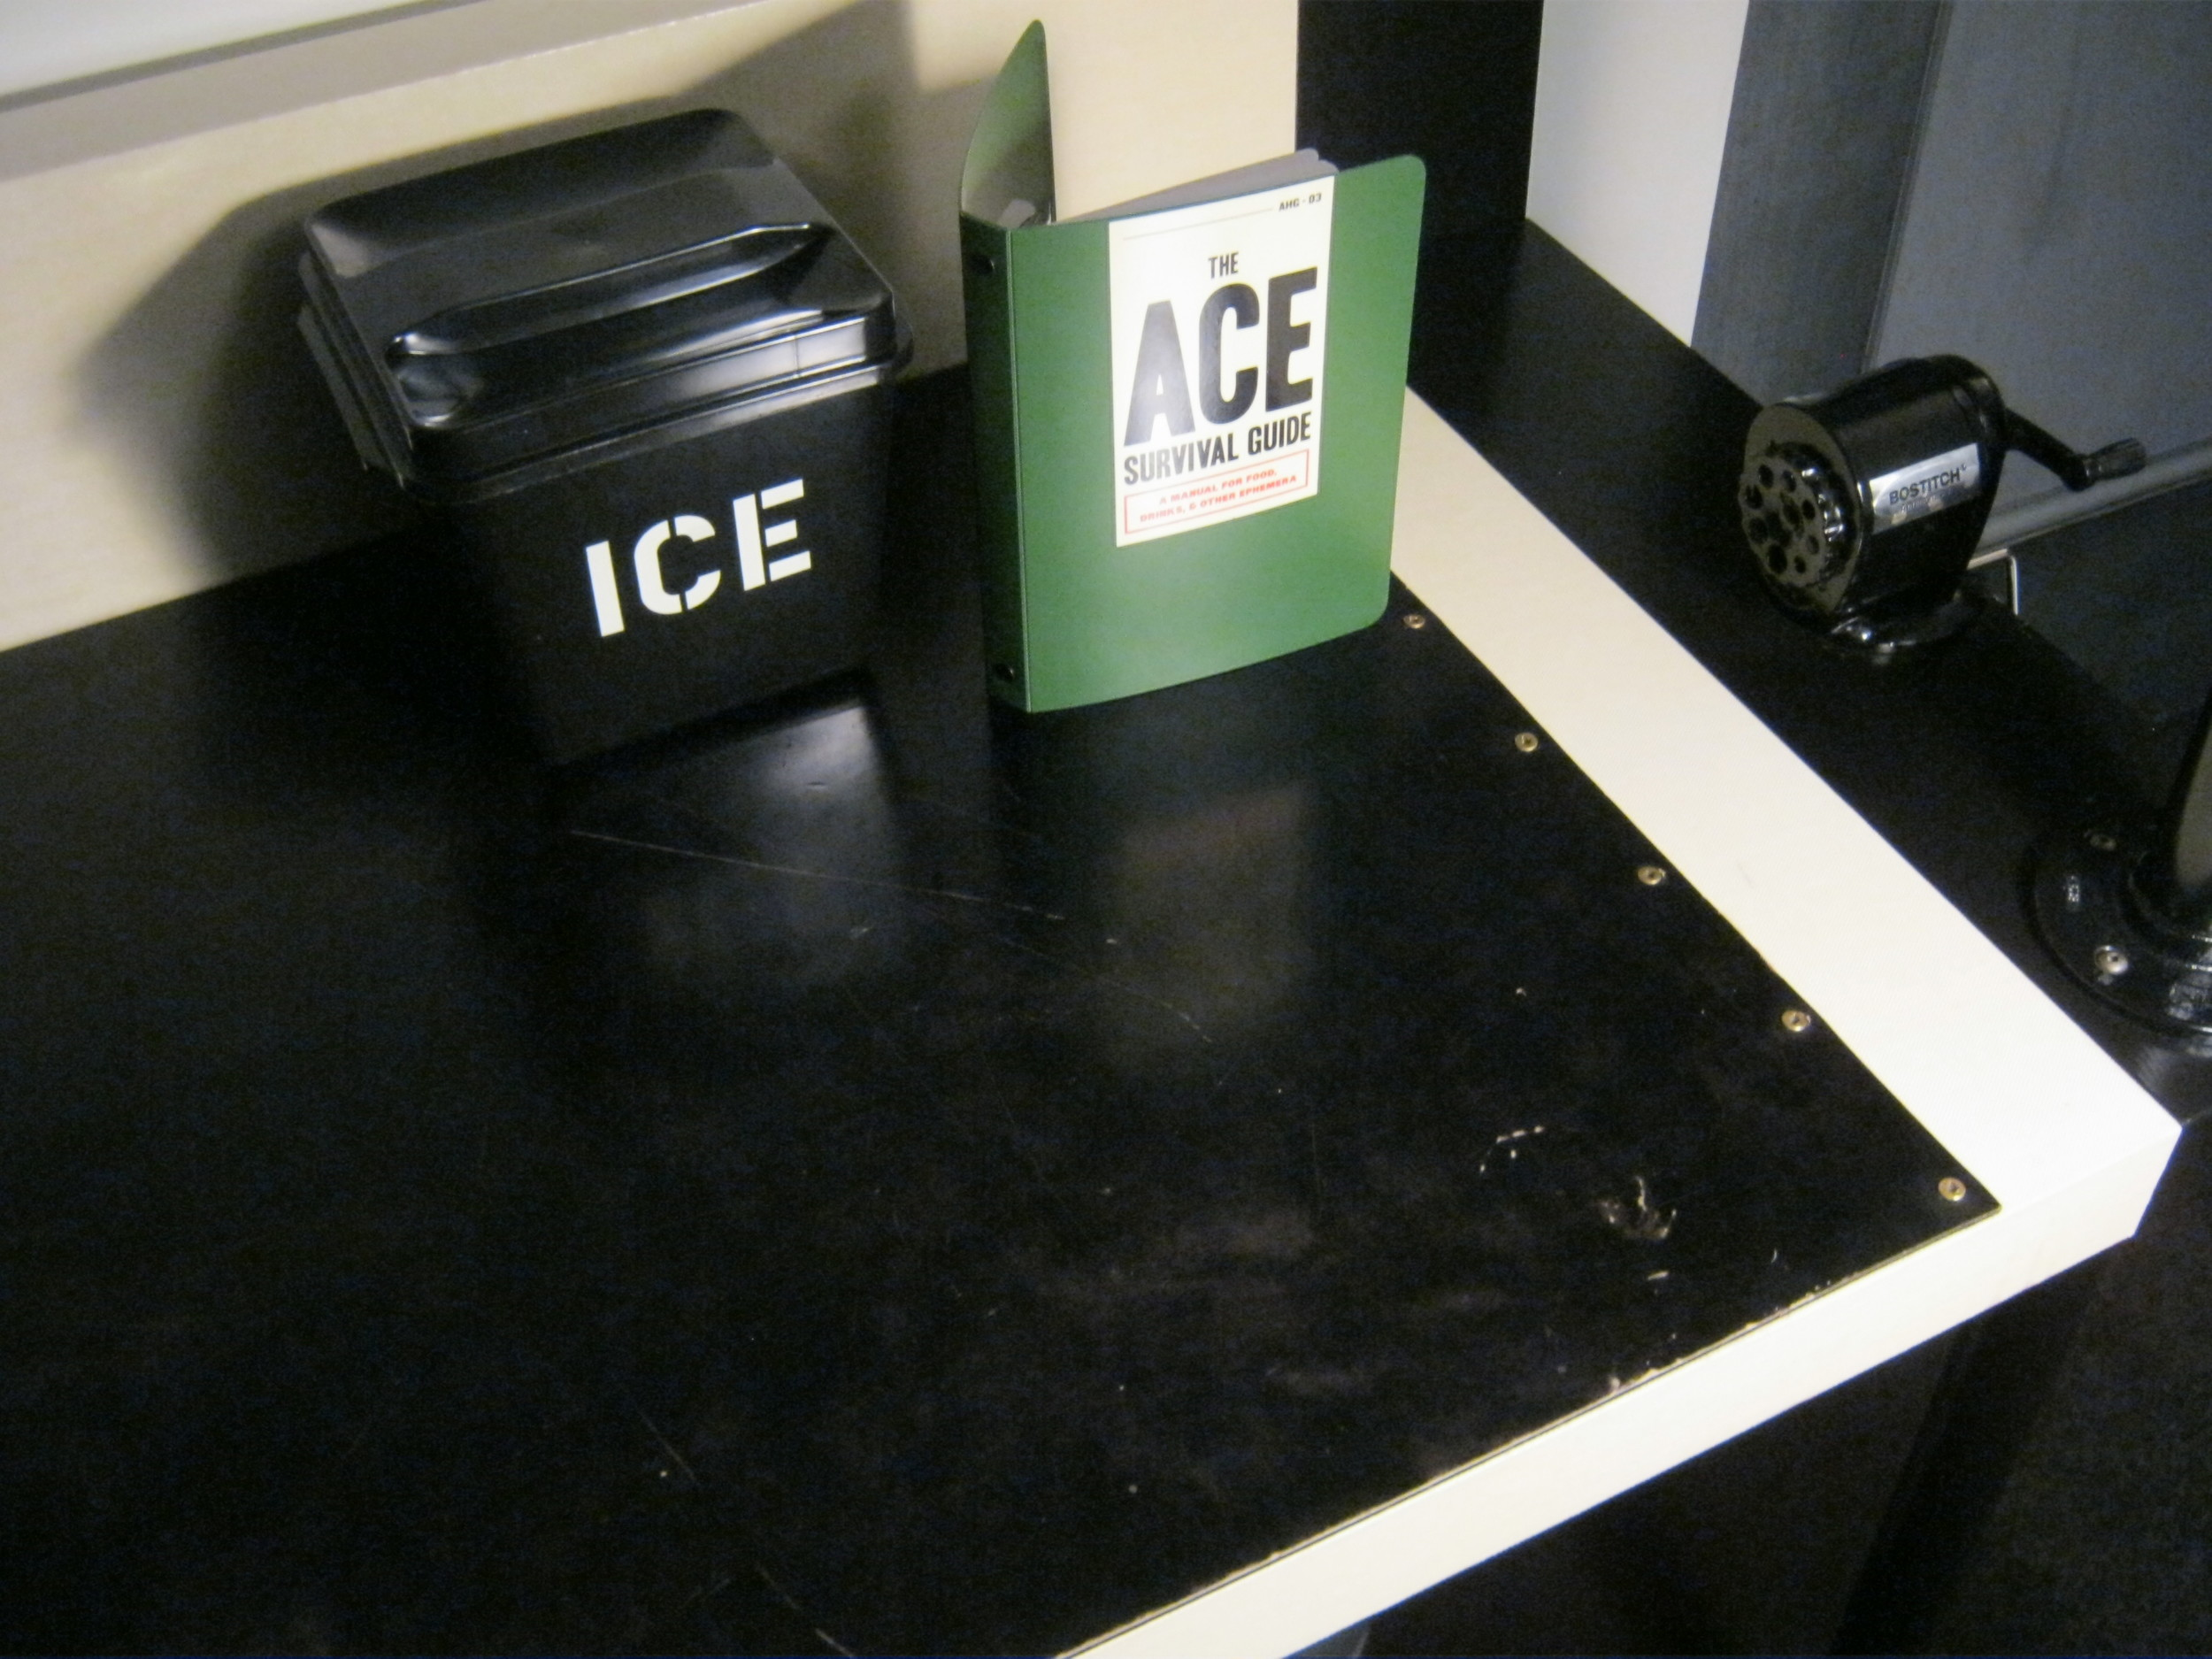 EcoDomo - Hotel Ace - Desktop - Distressed leather.JPG